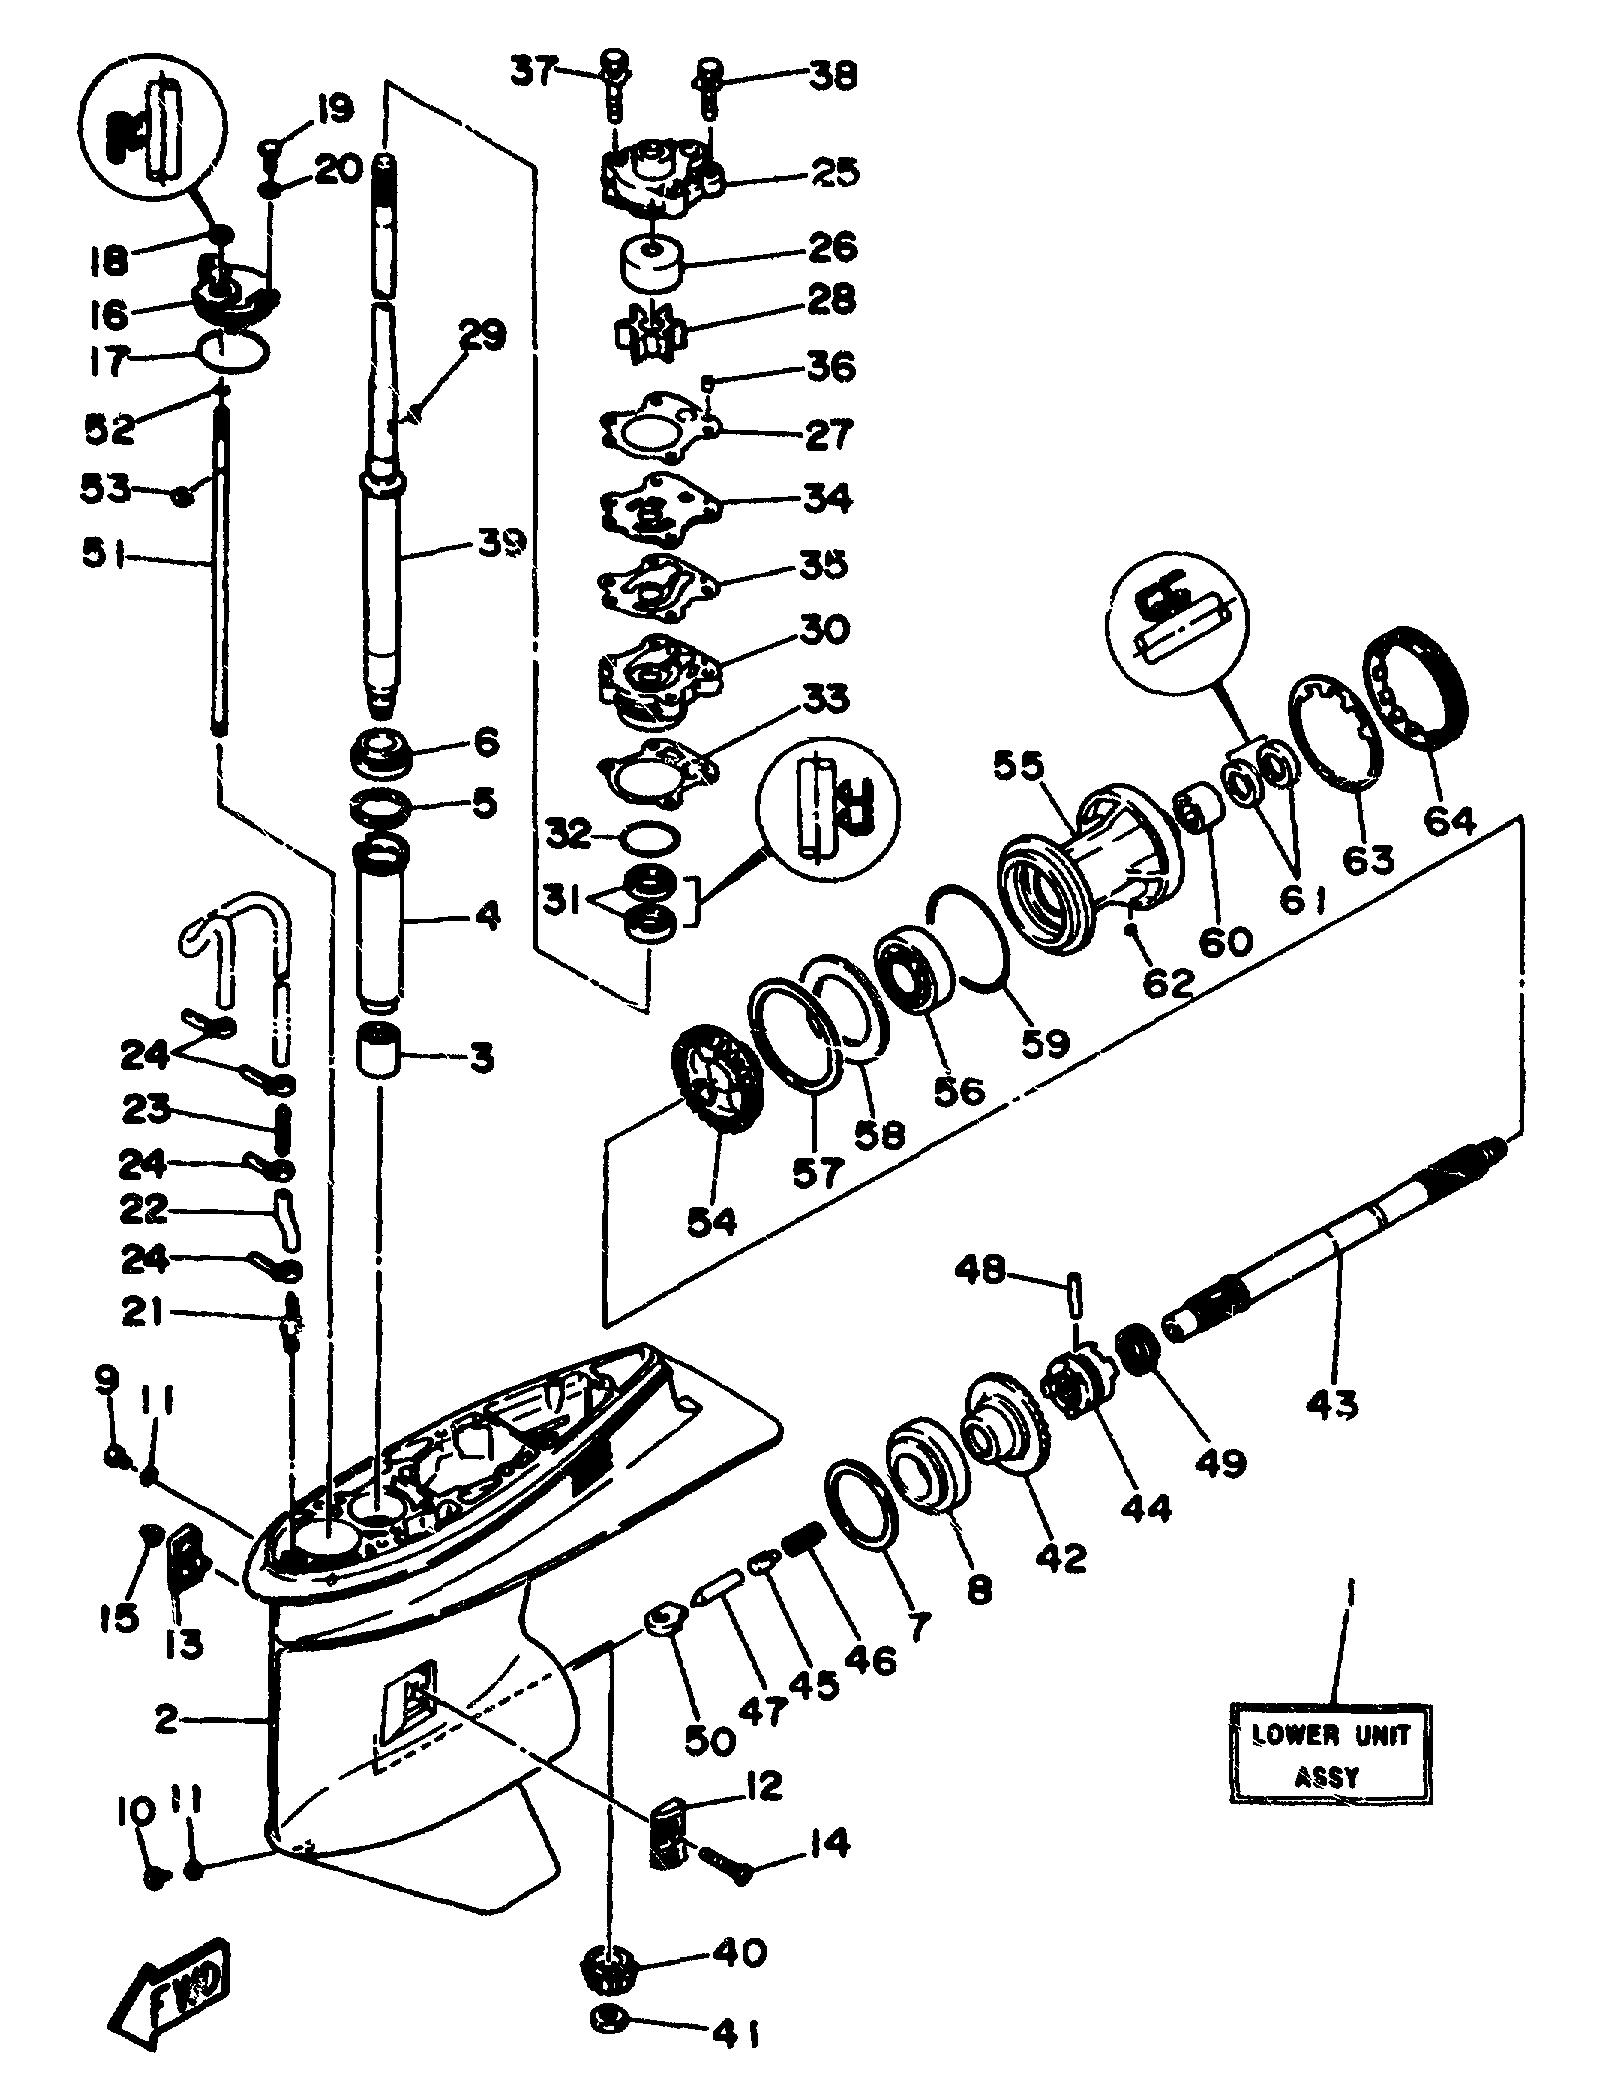 chrysler 55 hp outboard motor wiring diagrams image 9